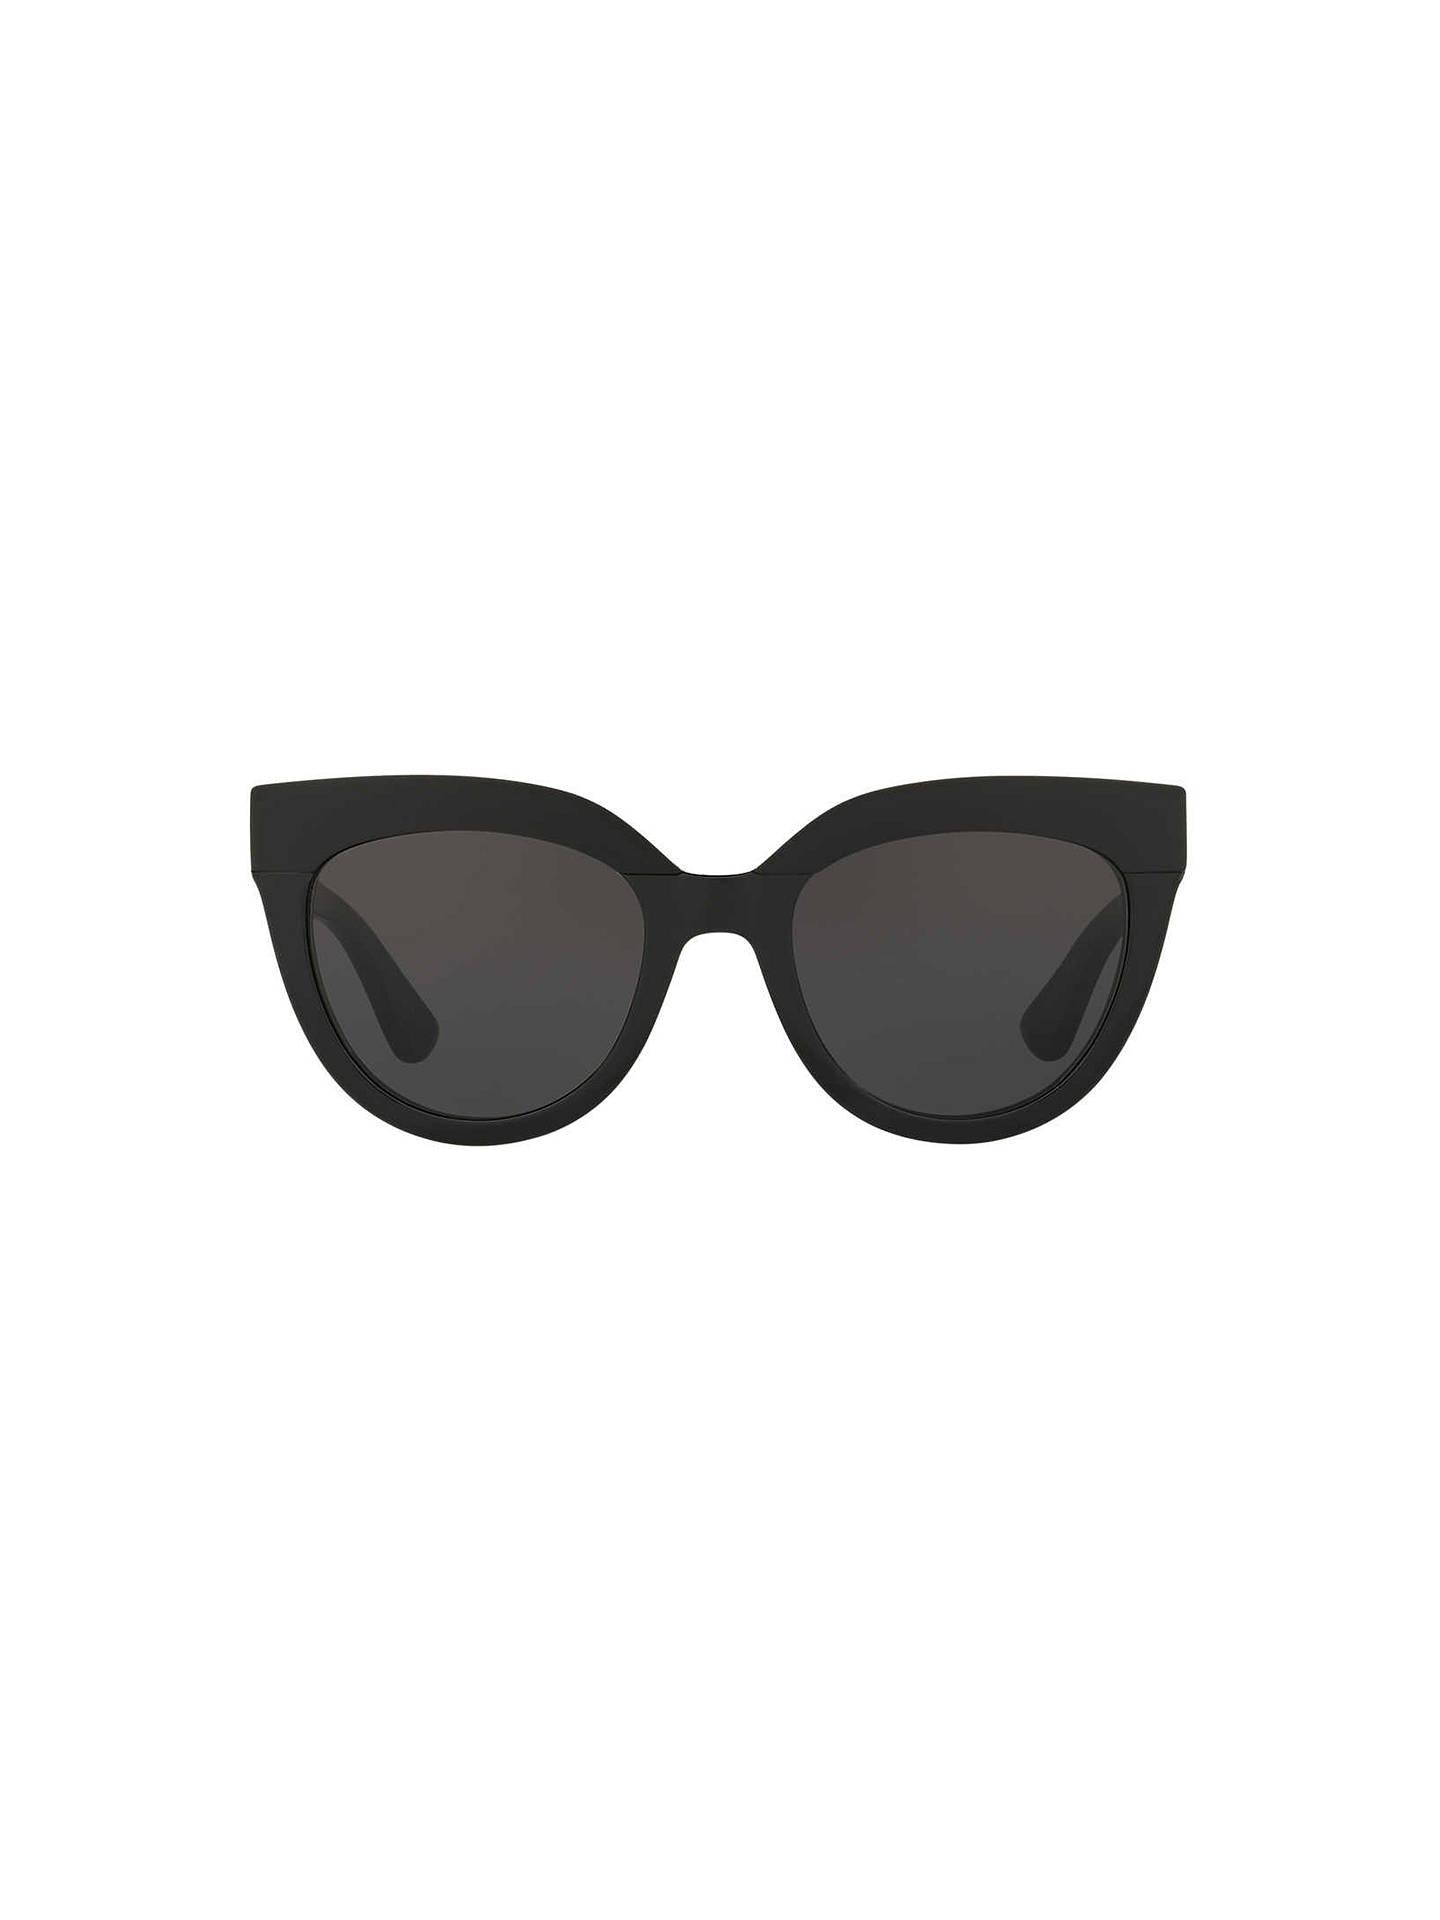 61e6b6249ccd ... Buy Dior DiorSoft1 Cat s Eye Sunglasses